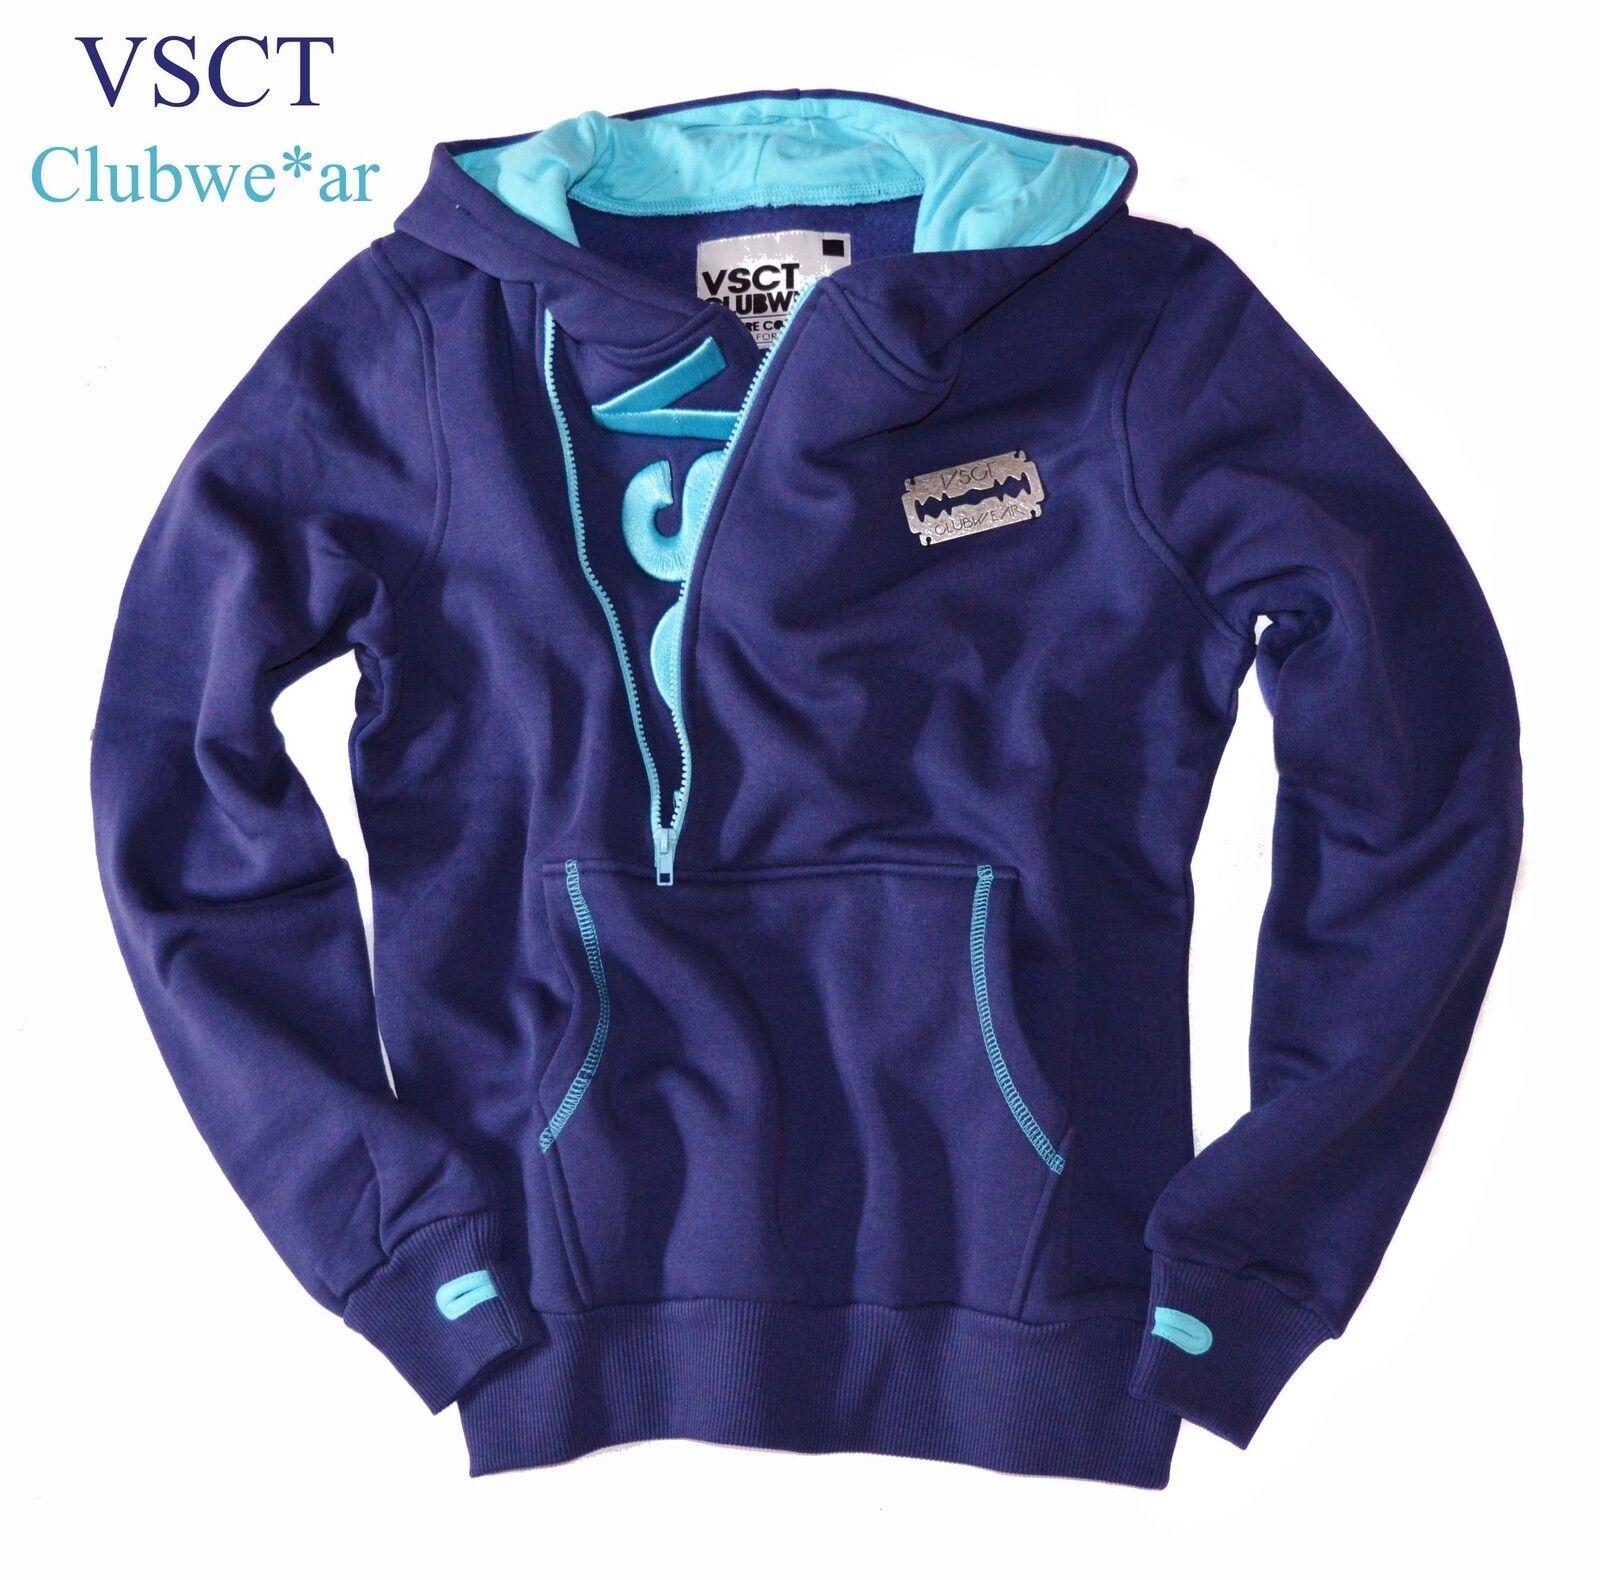 Sweatshirt by VSCT Hoody Gr.SC-Zip Logo Hoodie Kapuzen Sweater navy Neu